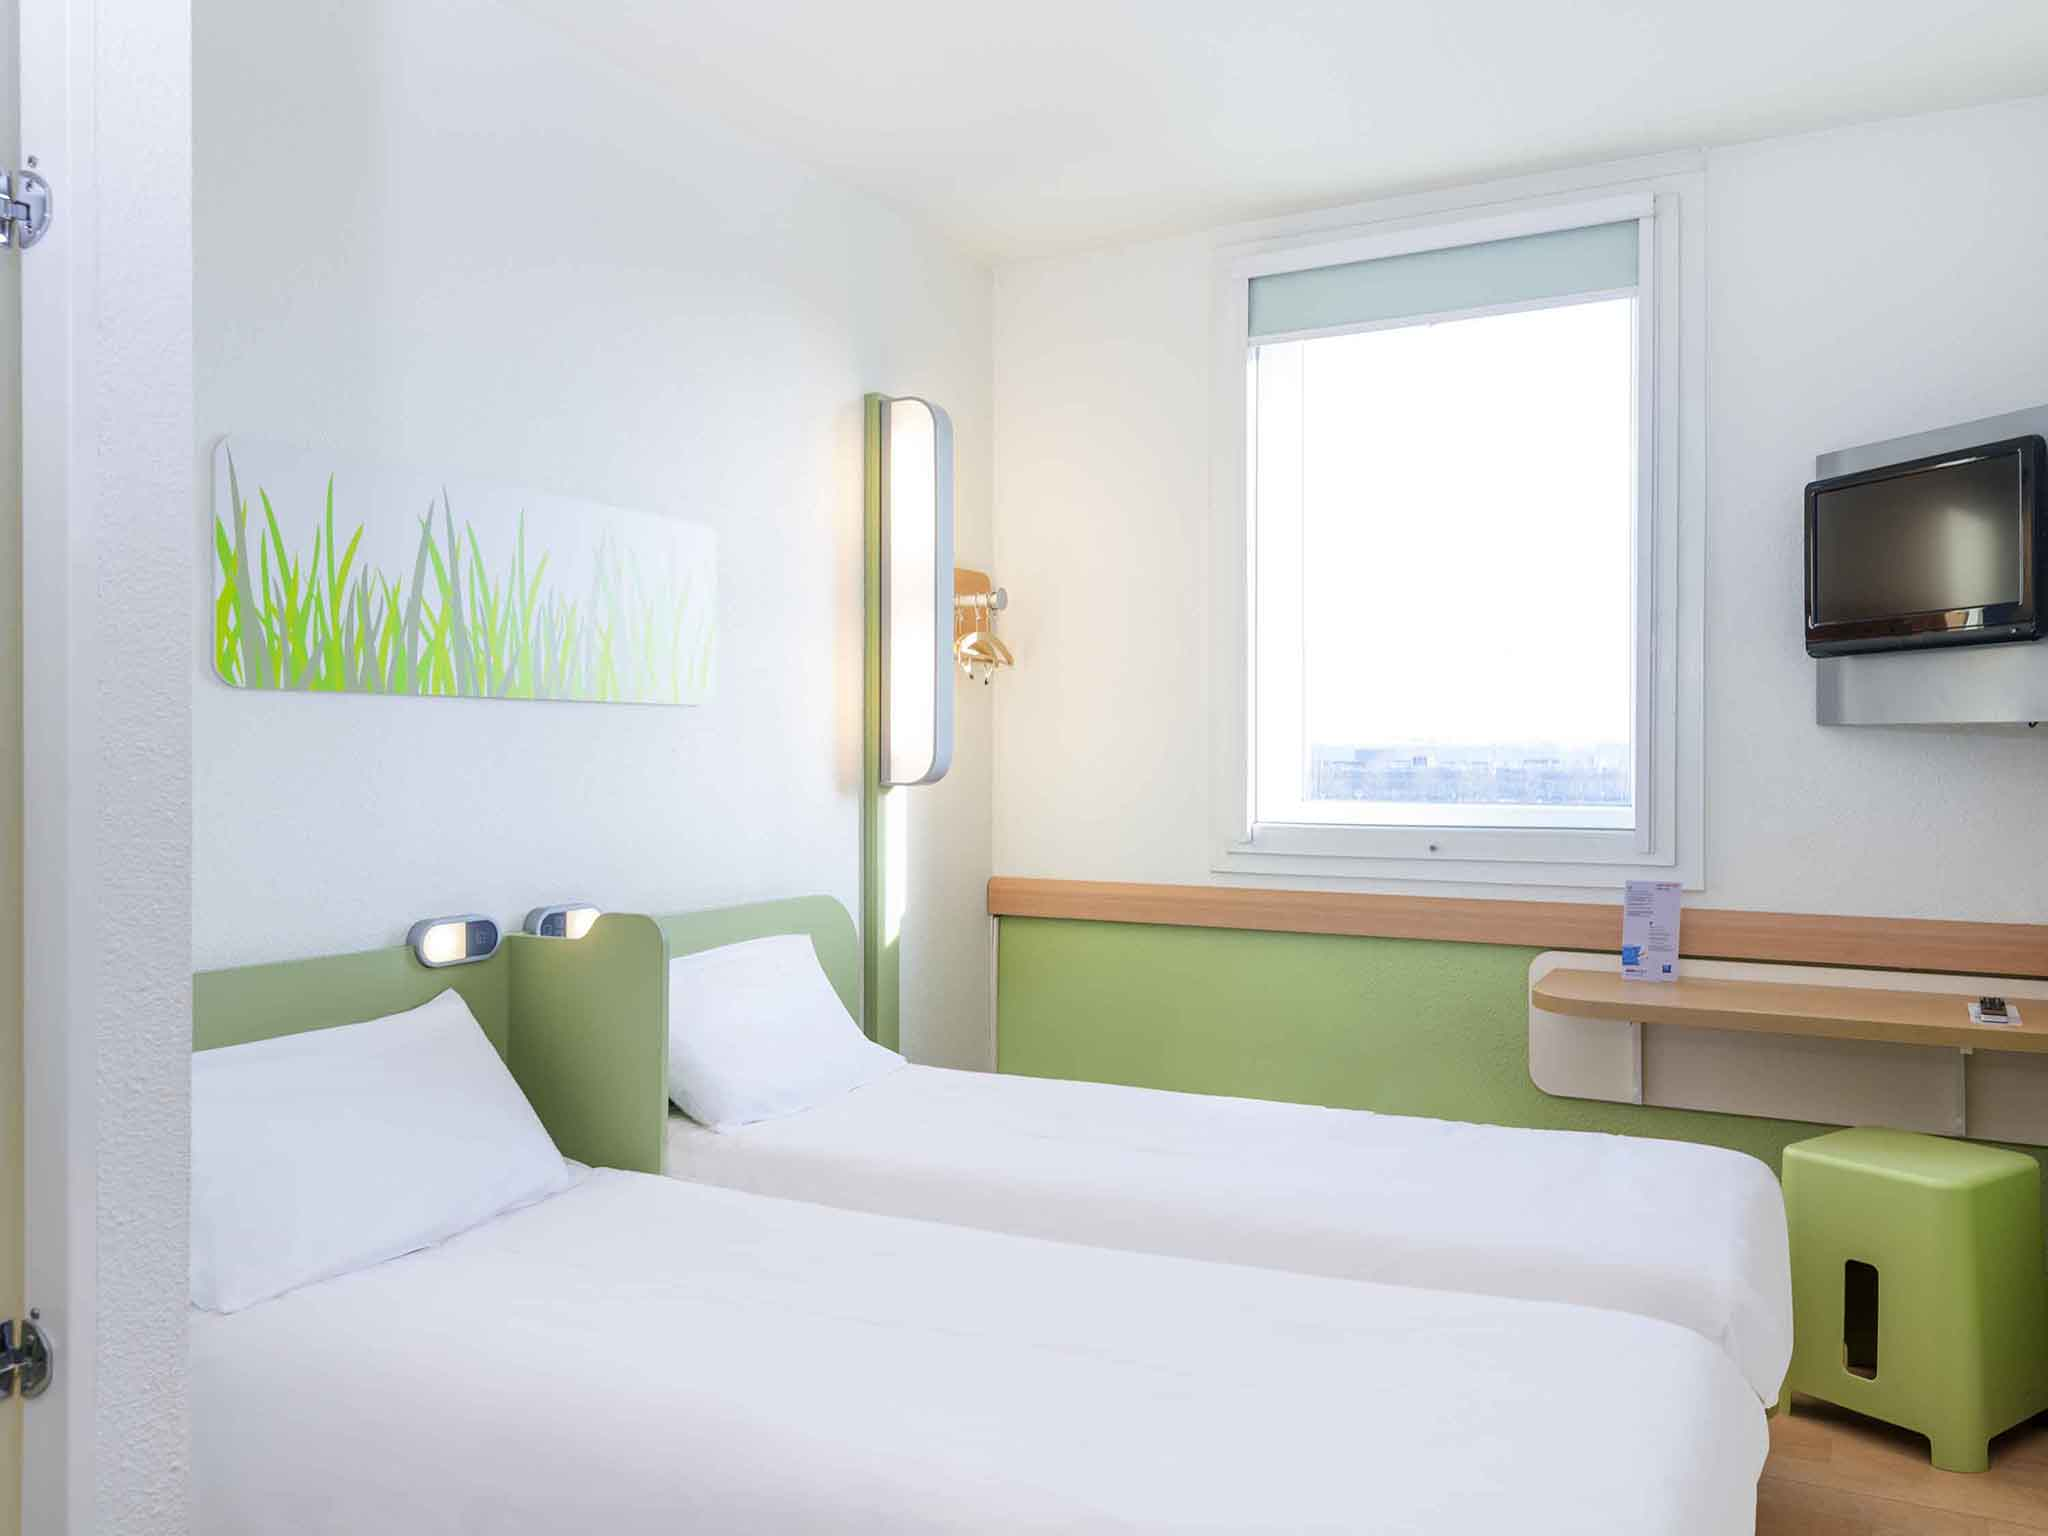 Hotel in ROISSY CHARLES DE GAULLE - ibis budget Roissy CDG ... - photo#10